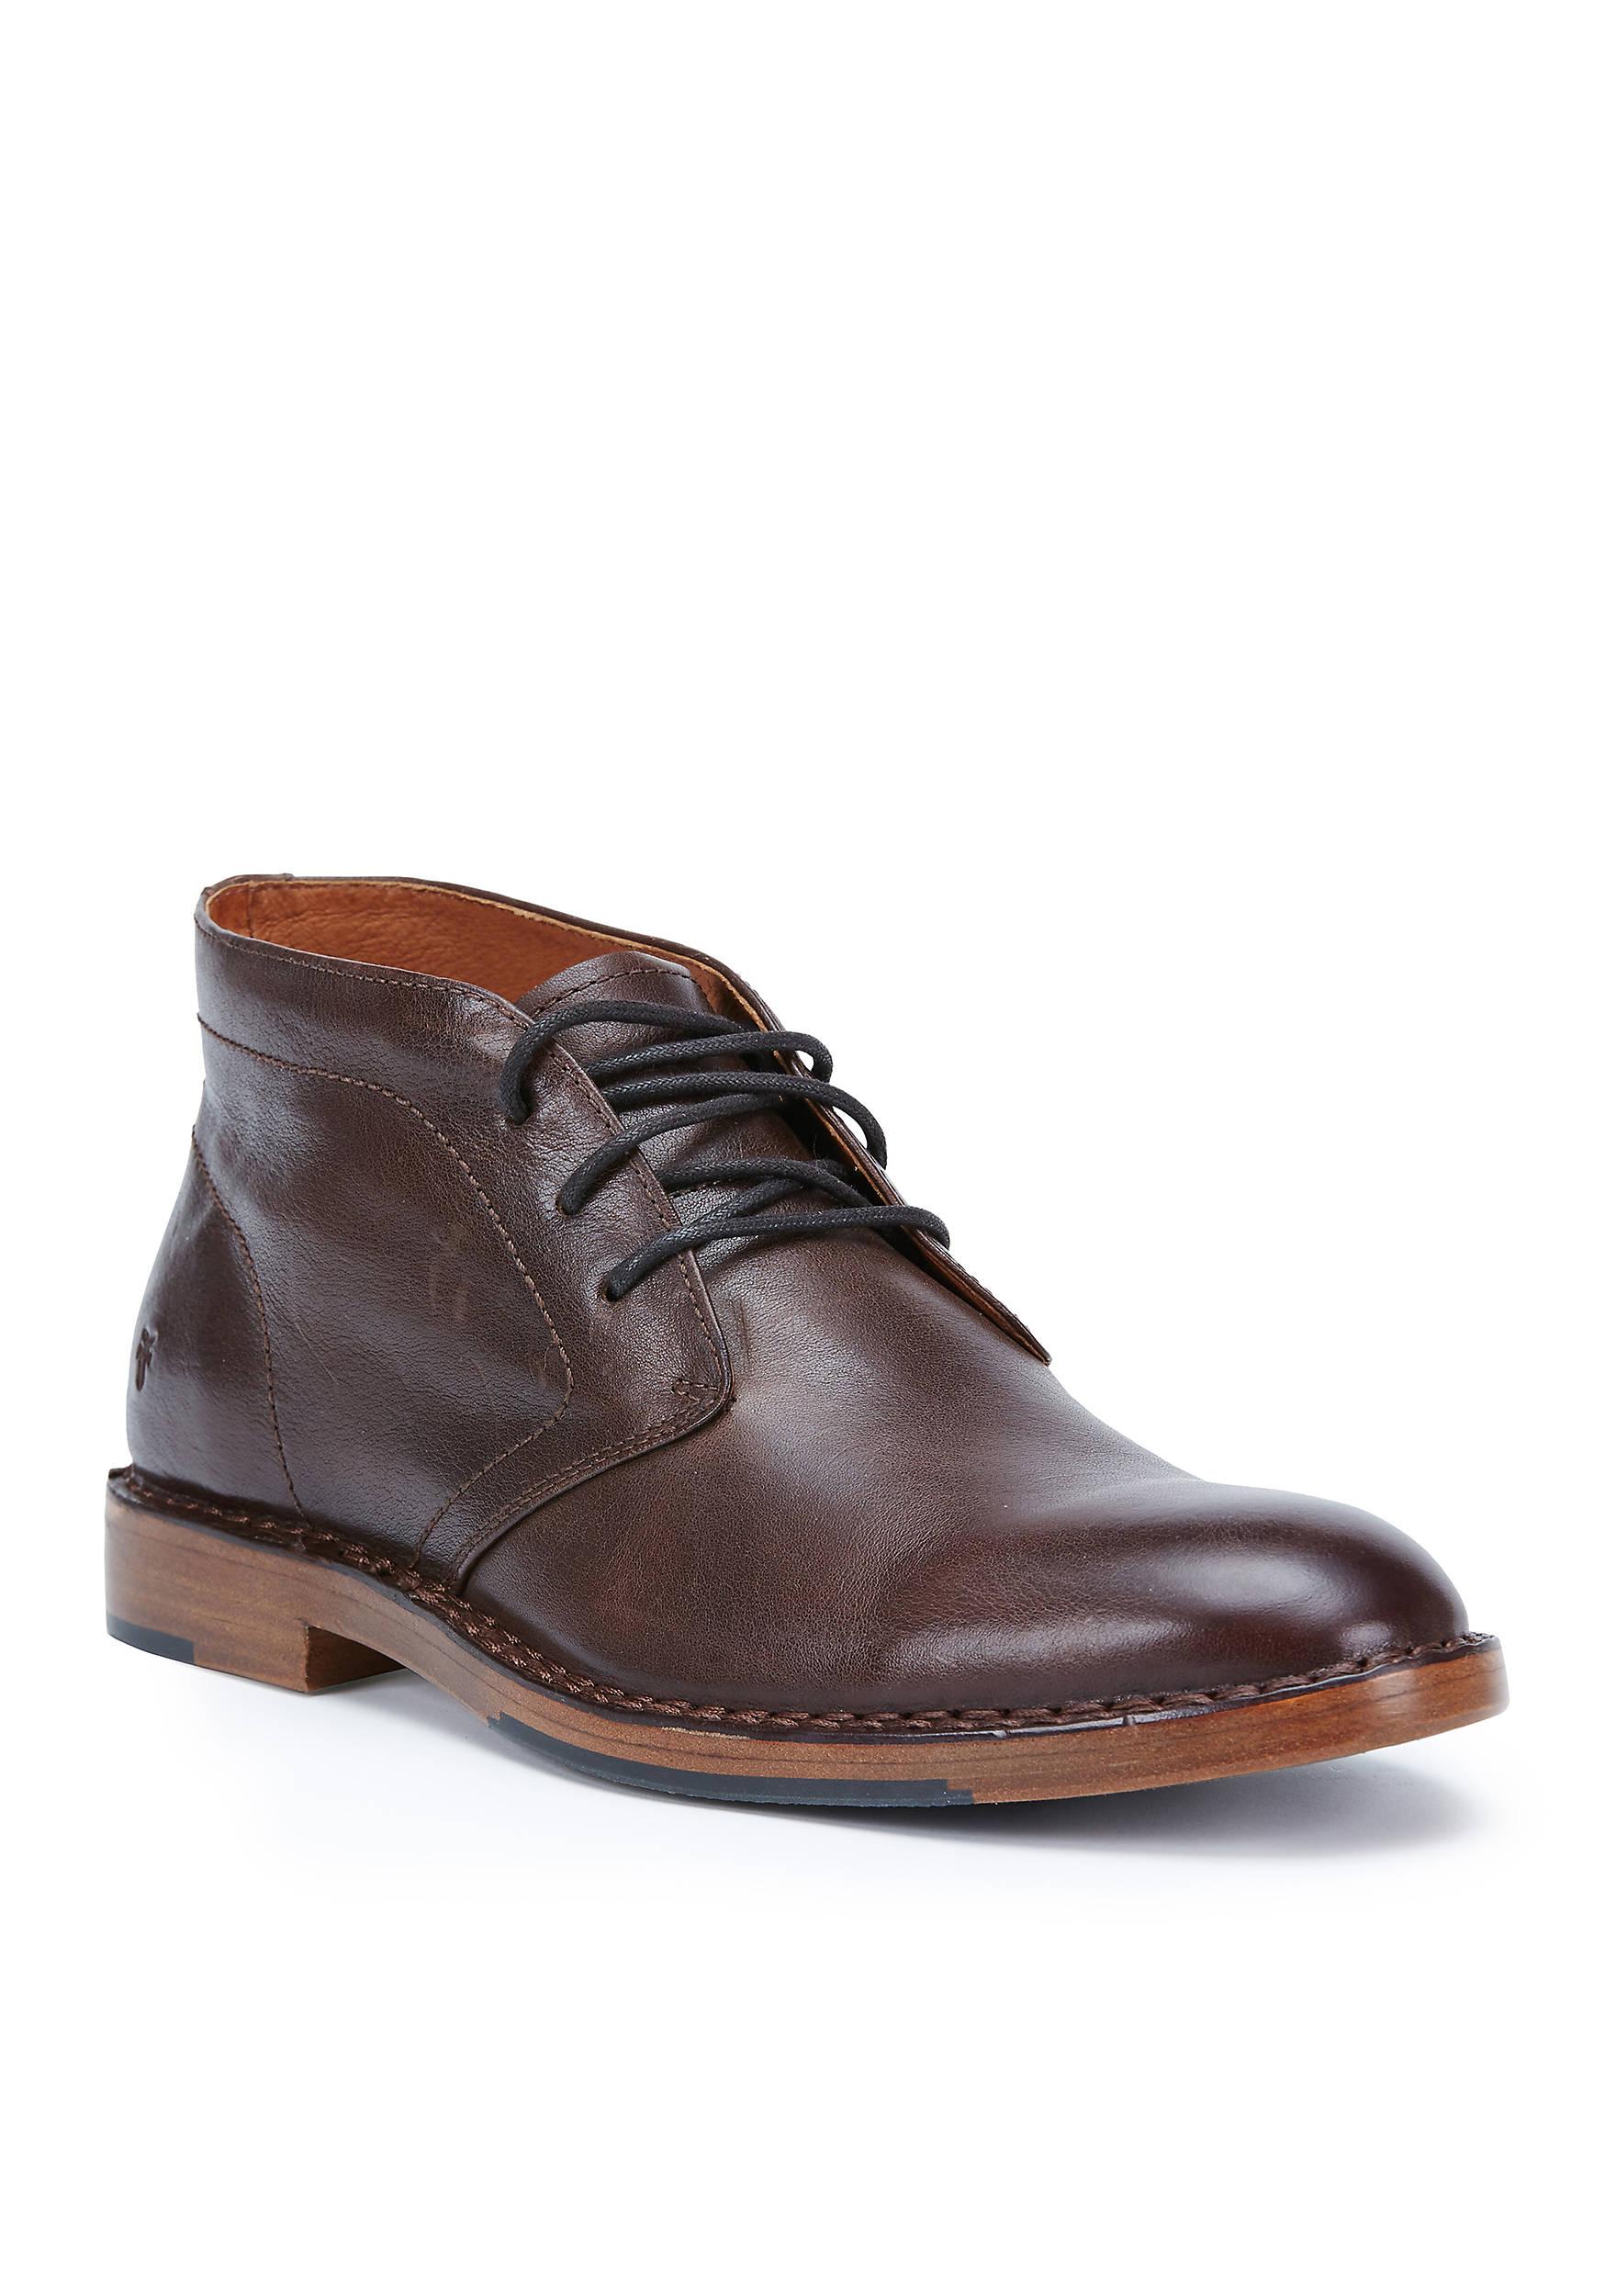 frye shoes men 90 outfits calvin